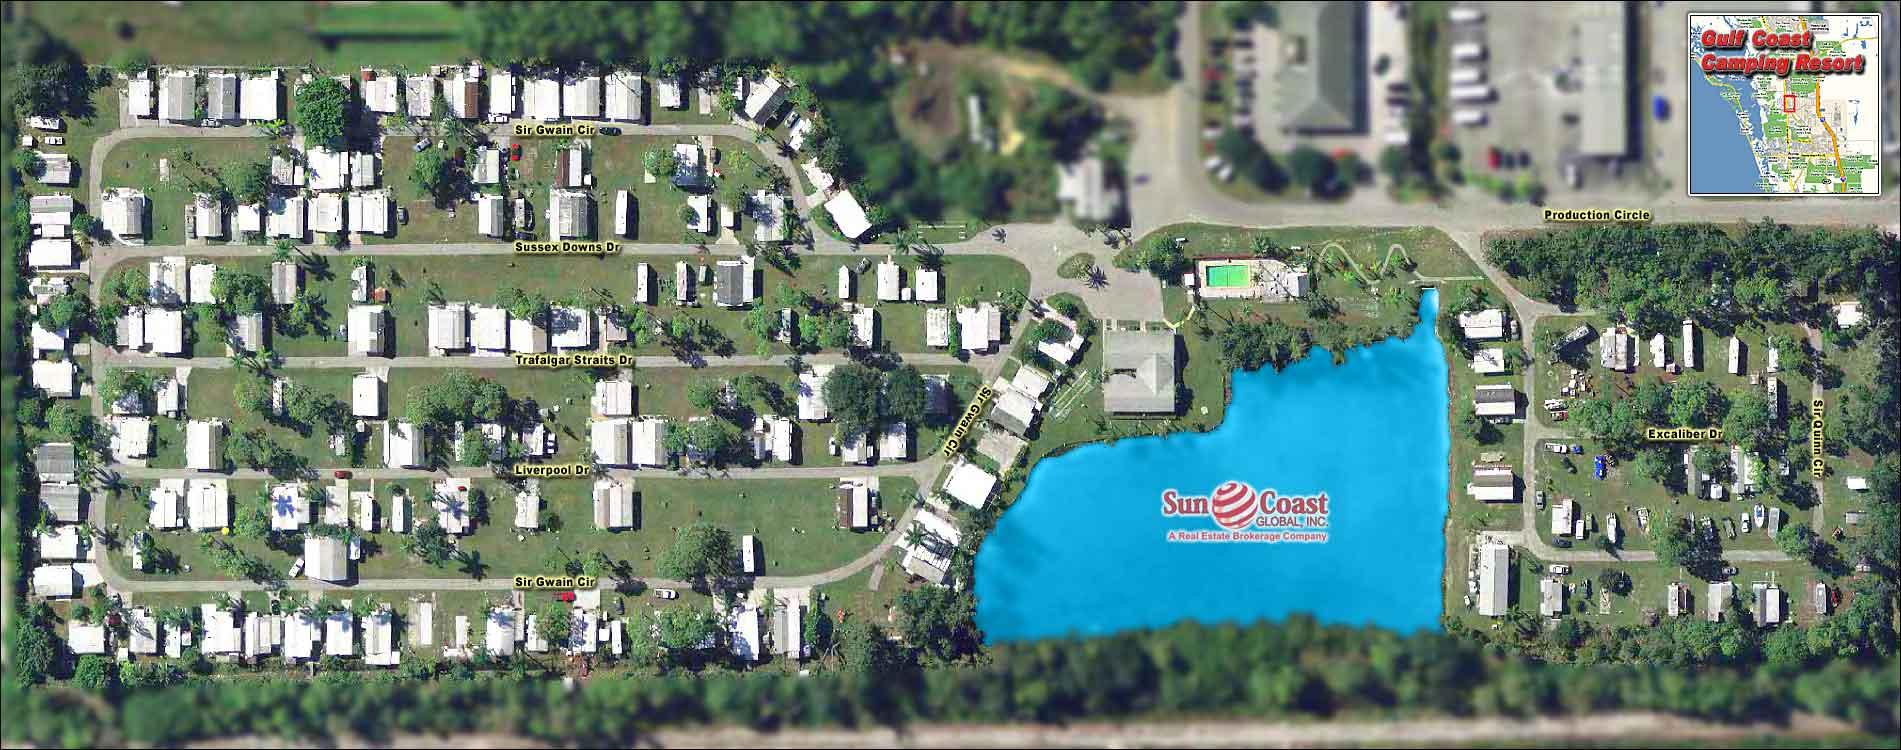 Gulf Coast Camping Resort Real Estate Bonita Springs